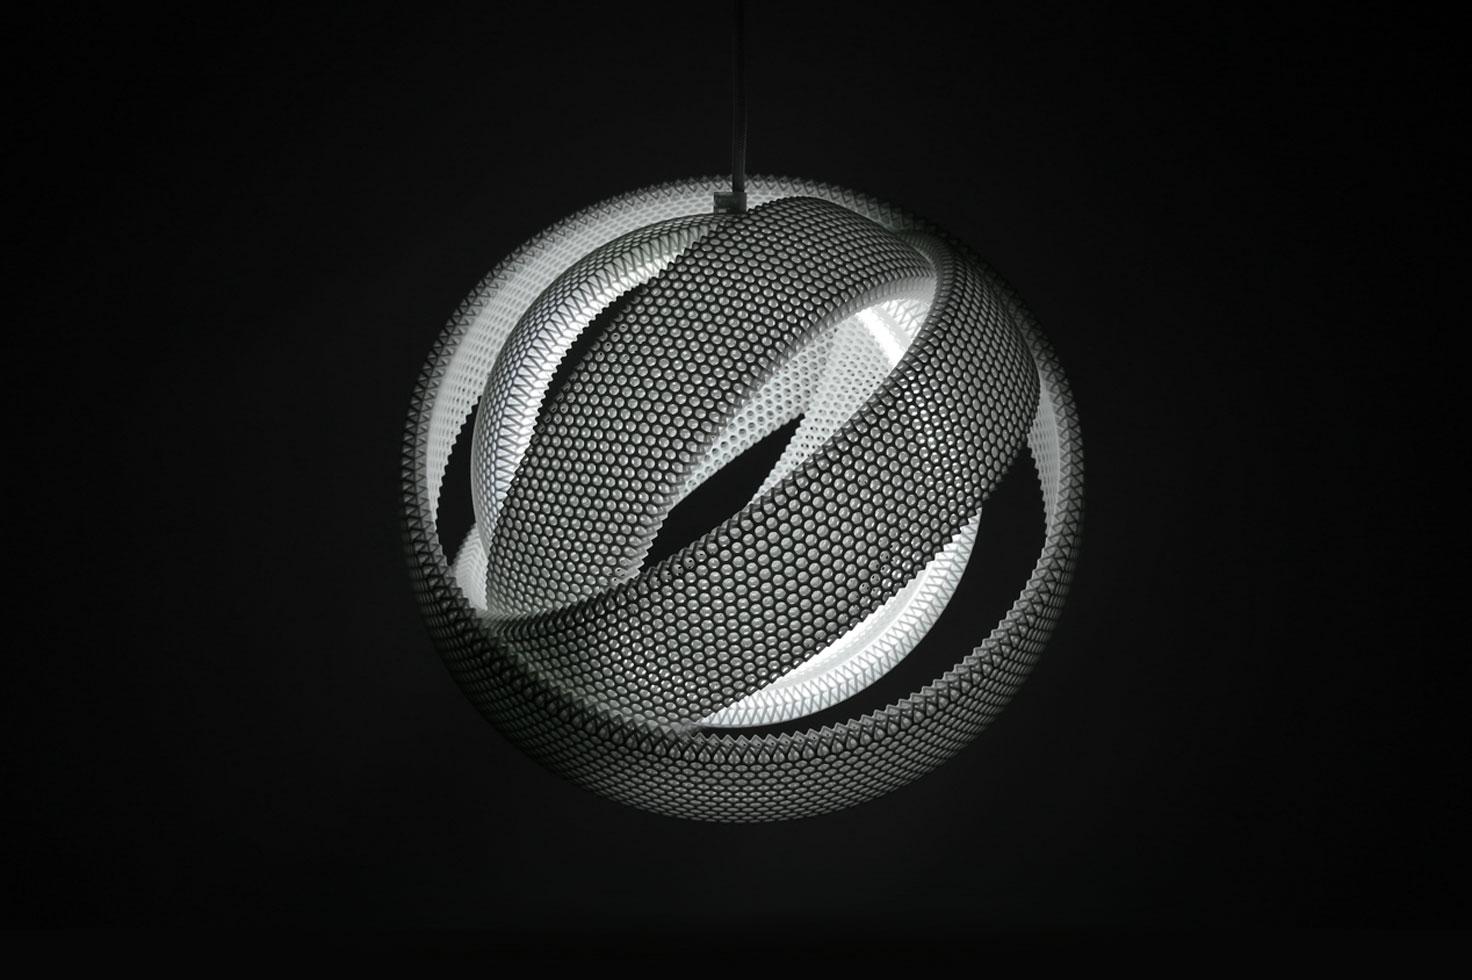 Atomic Light By WertelOberfell